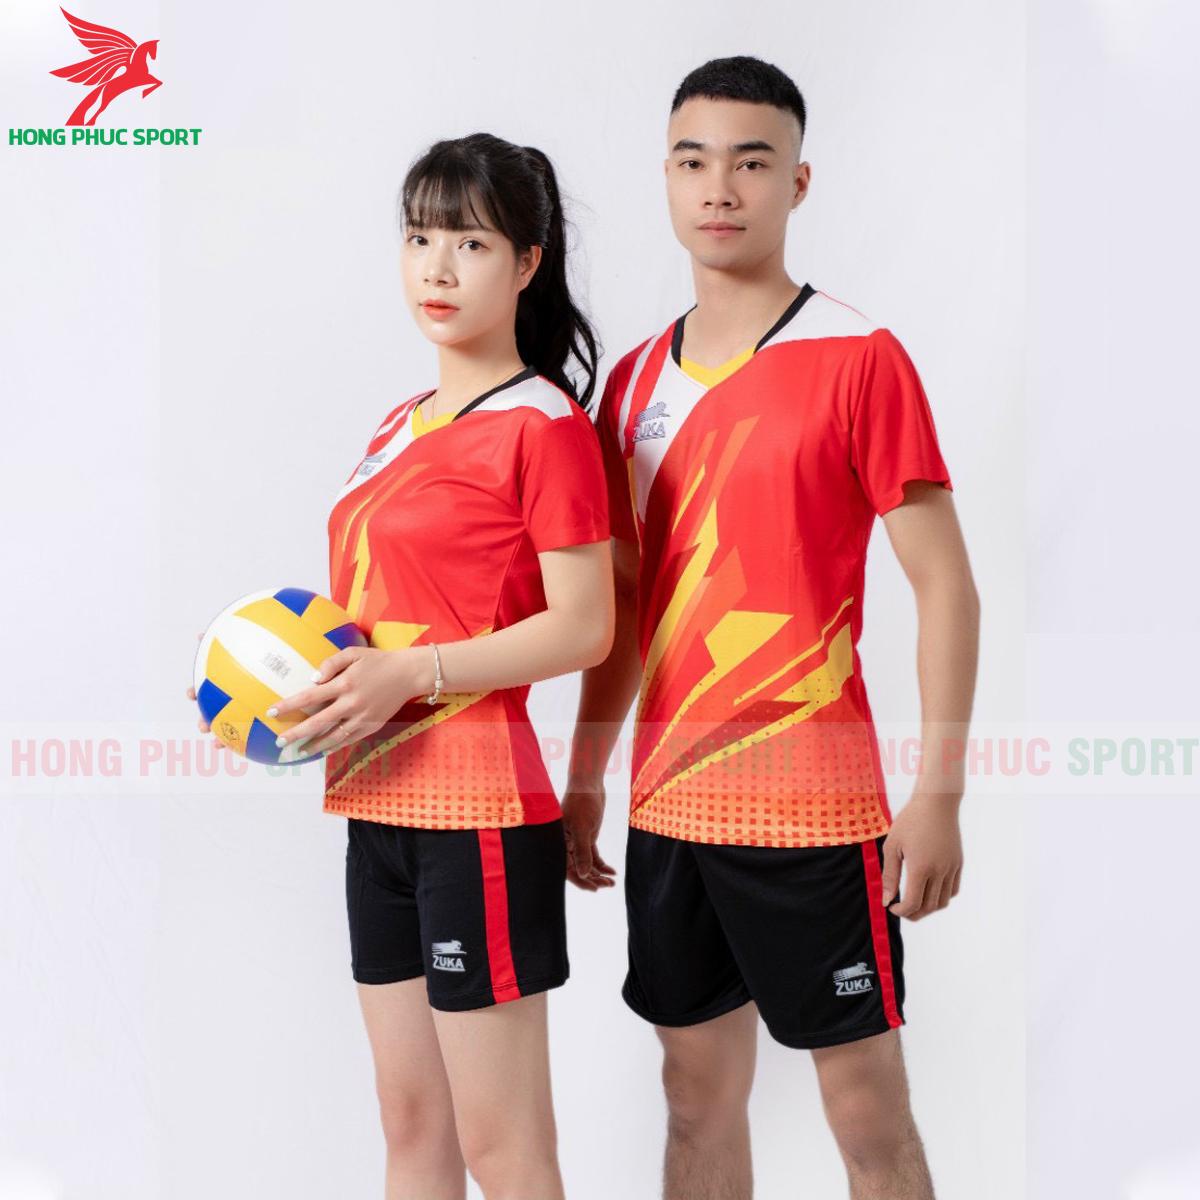 https://cdn.hongphucsport.com/unsafe/s4.shopbay.vn/files/285/quan-ao-bong-chuyen-zuka-01-2021-mau-do-3-60750bd86374d.png